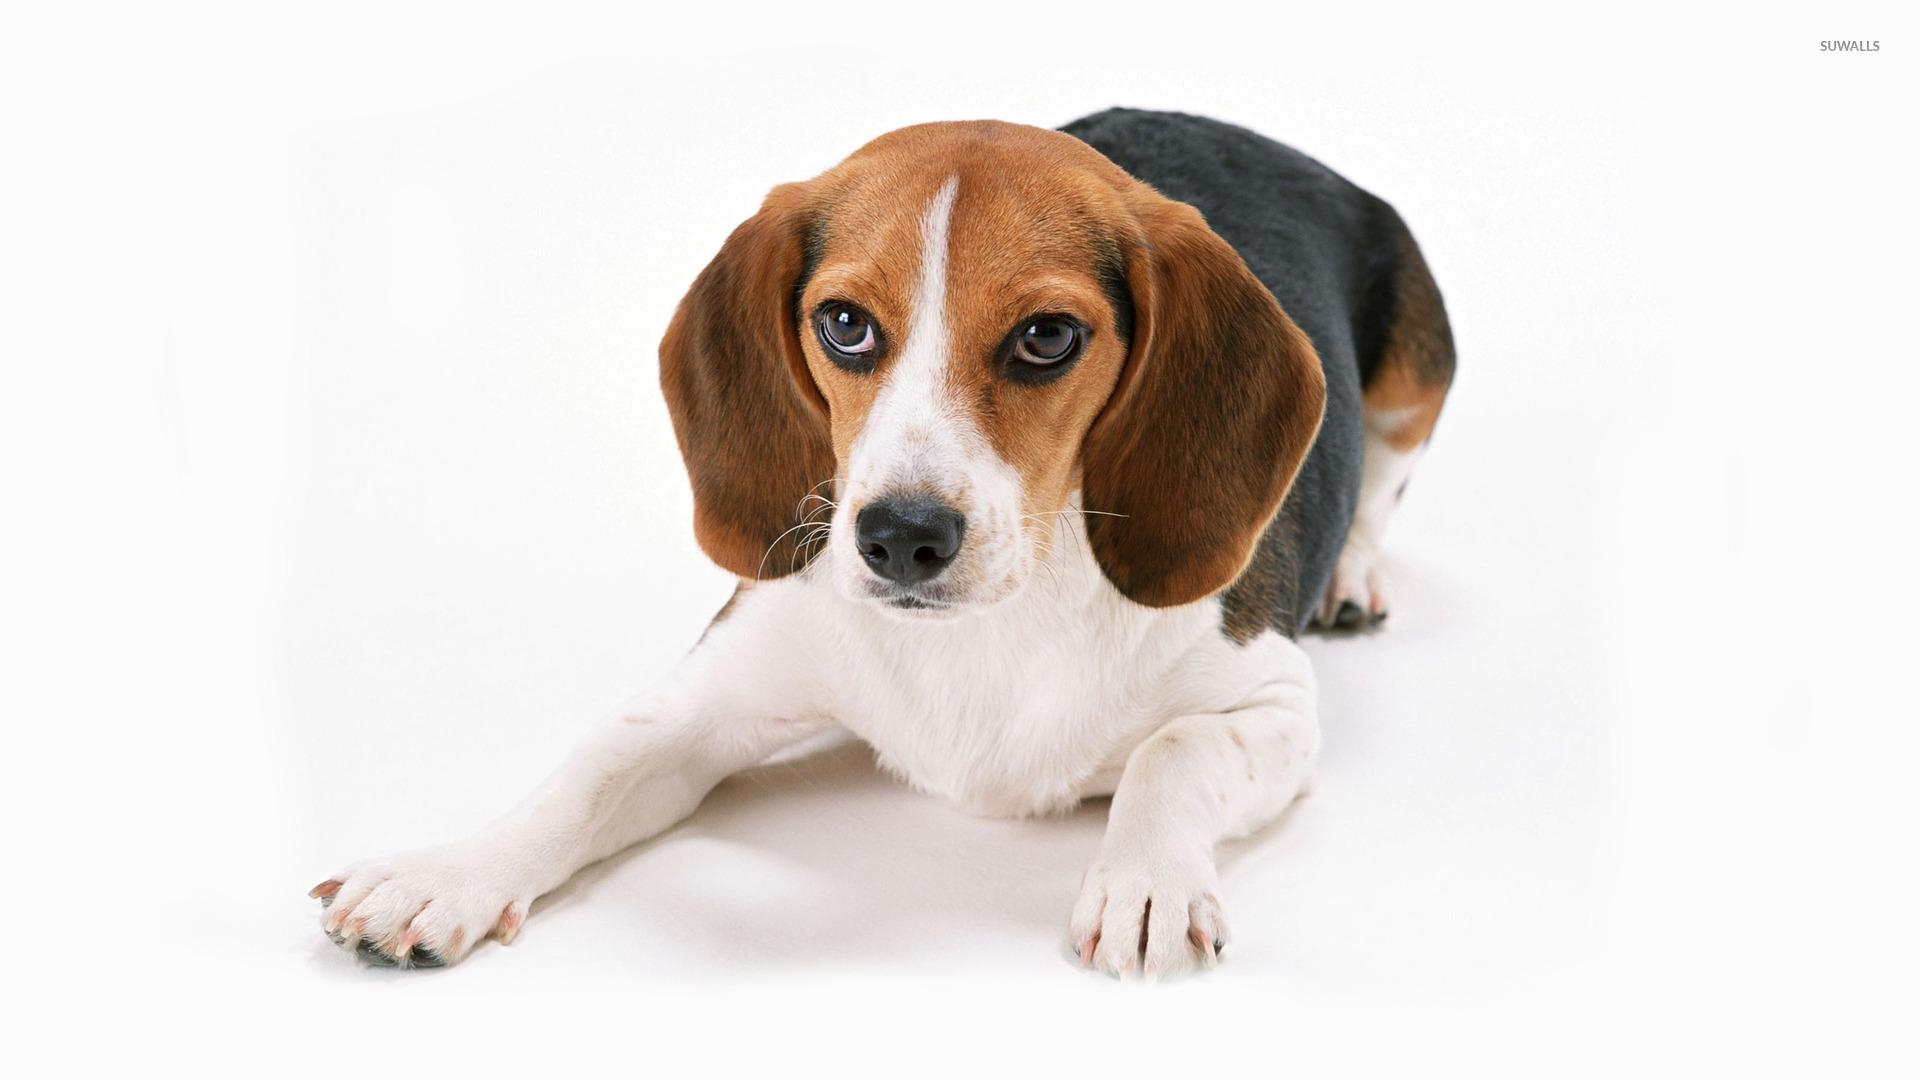 Beagle wallpaper   Animal wallpapers   17934 1920x1080